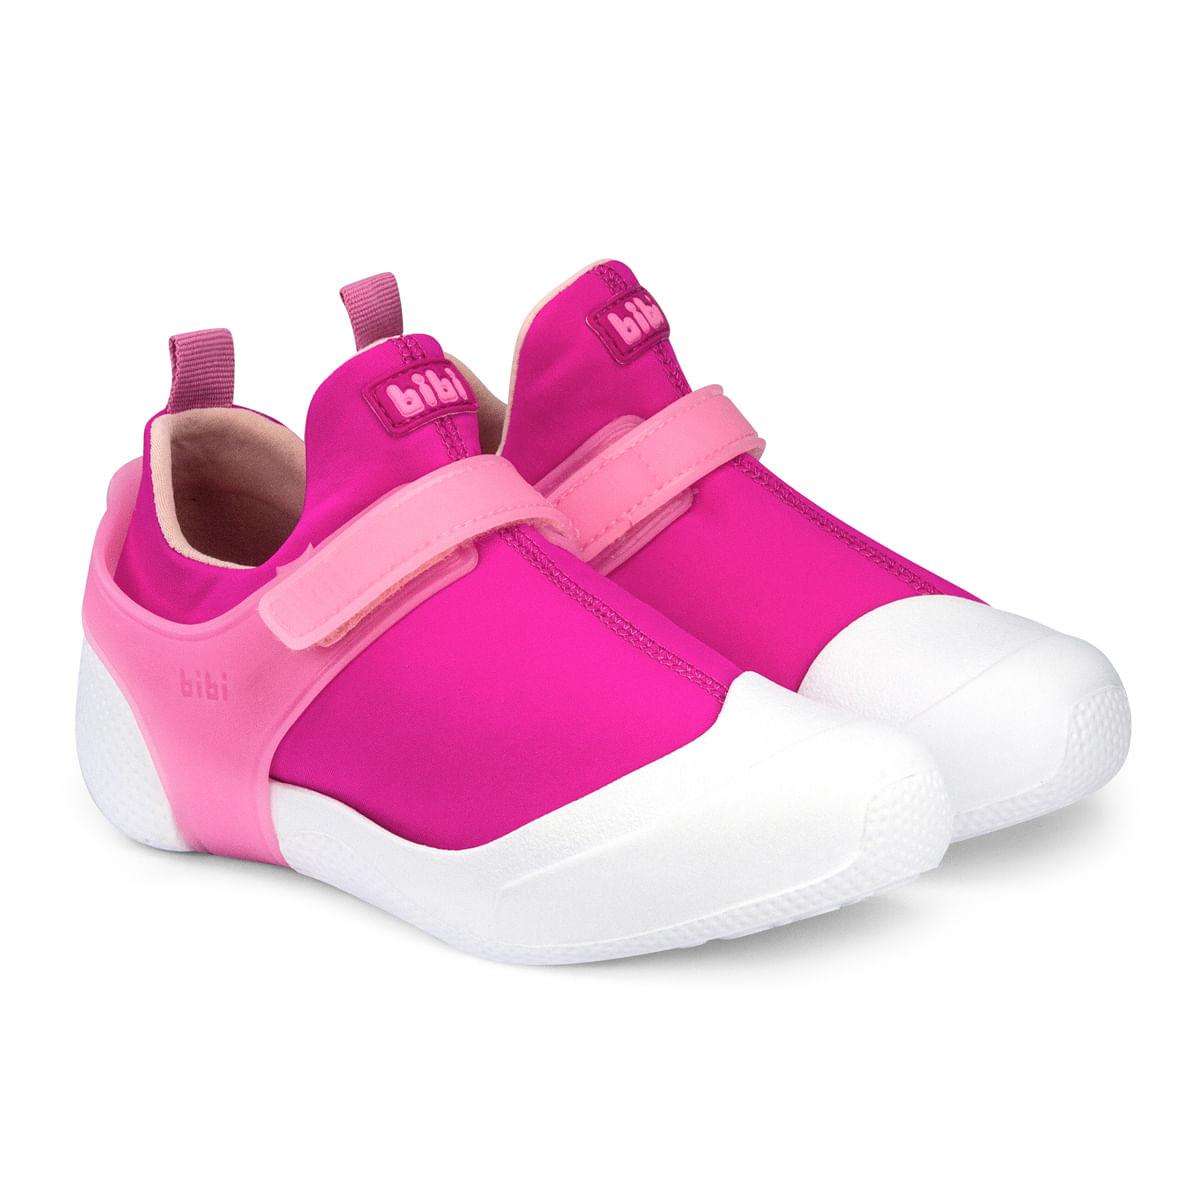 002aa47b47f Tênis Infantil Bibi Feminino Rosa 2WAY 1093005 - Bibi Calçados